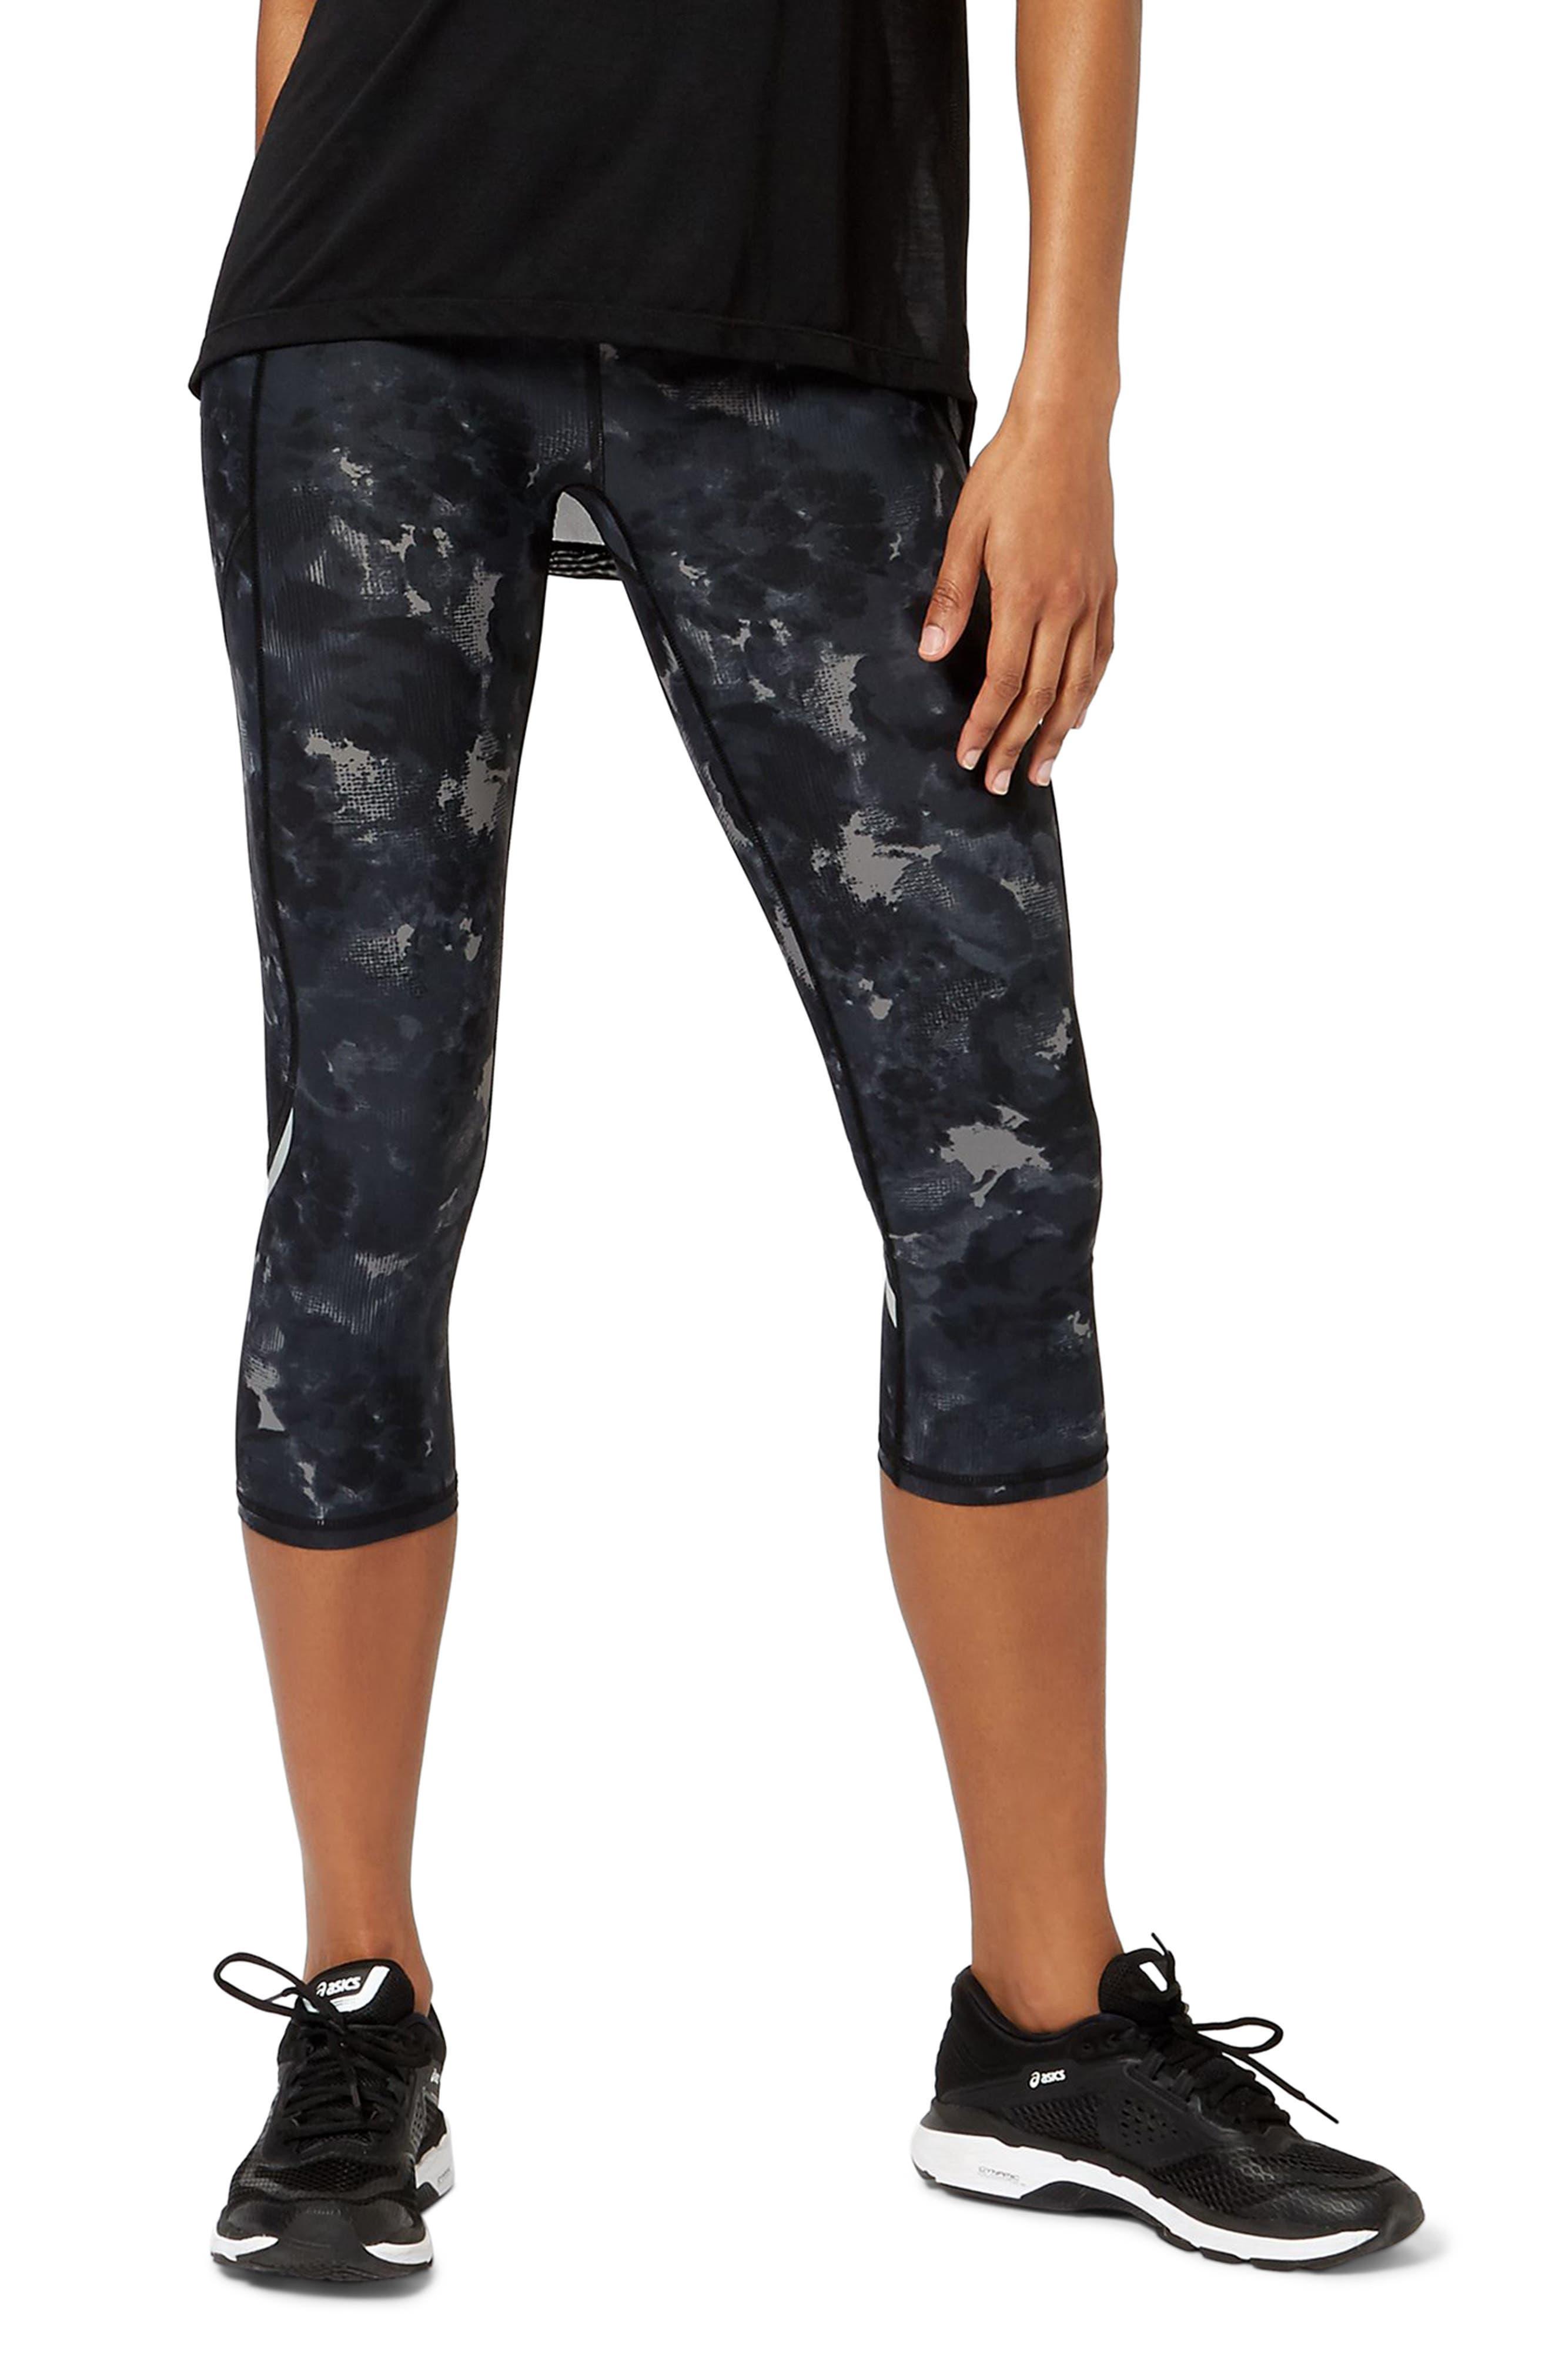 Zero Gravity Crop Leggings,                         Main,                         color, BLACK MARKET FLORAL PRINT